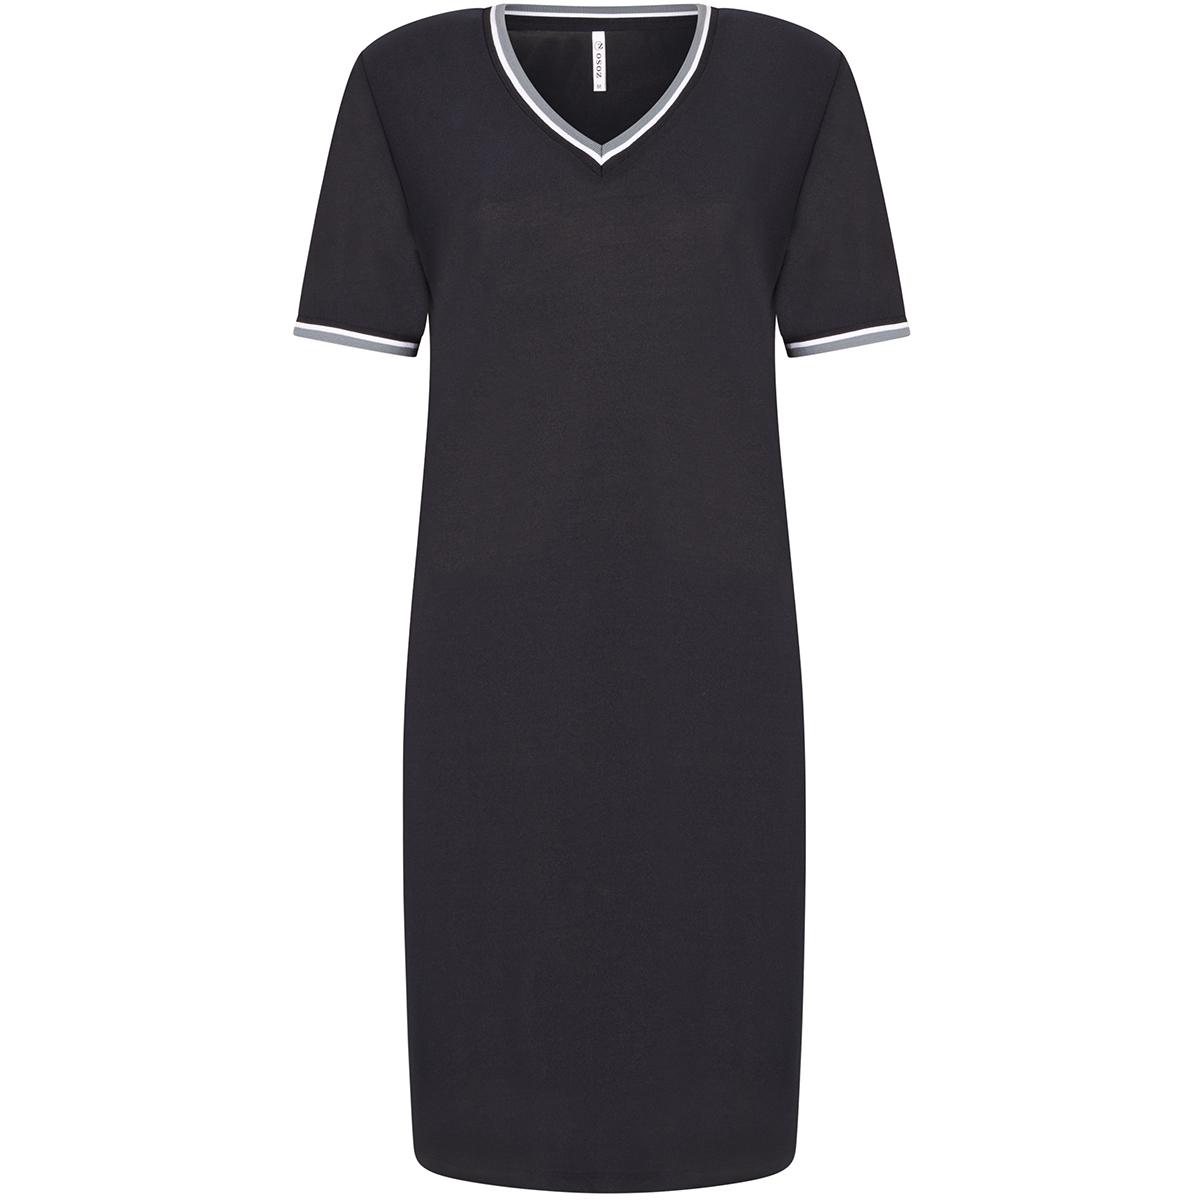 odette splendour dress 202 zoso jurk navy